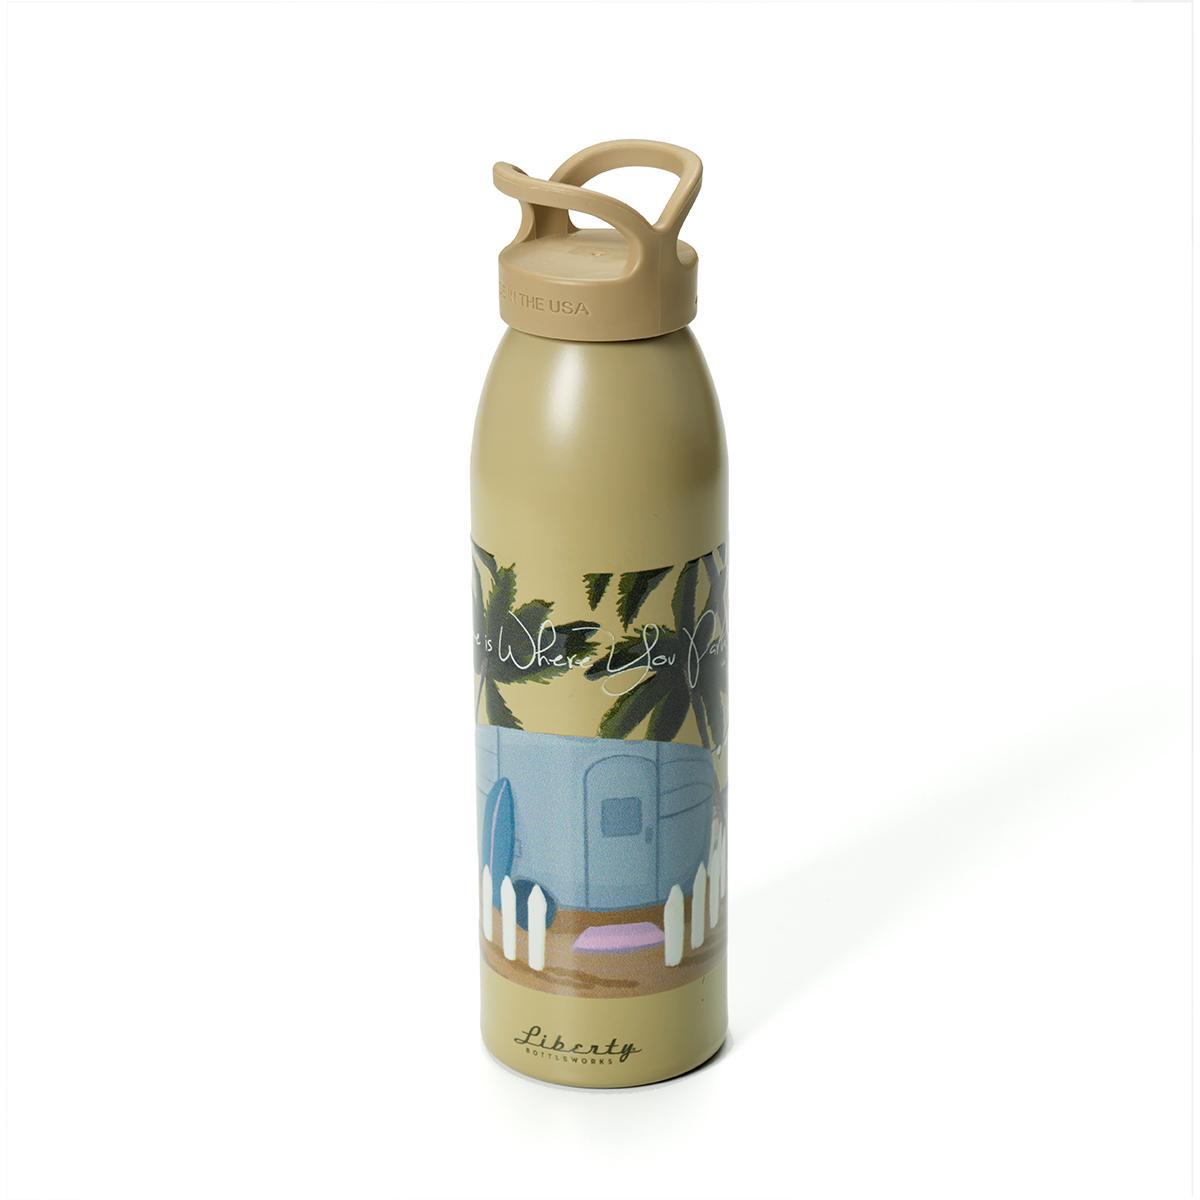 AIRMKT eCom PN 44482W-51 Water Bottle Day Camping Art 49970 WEB